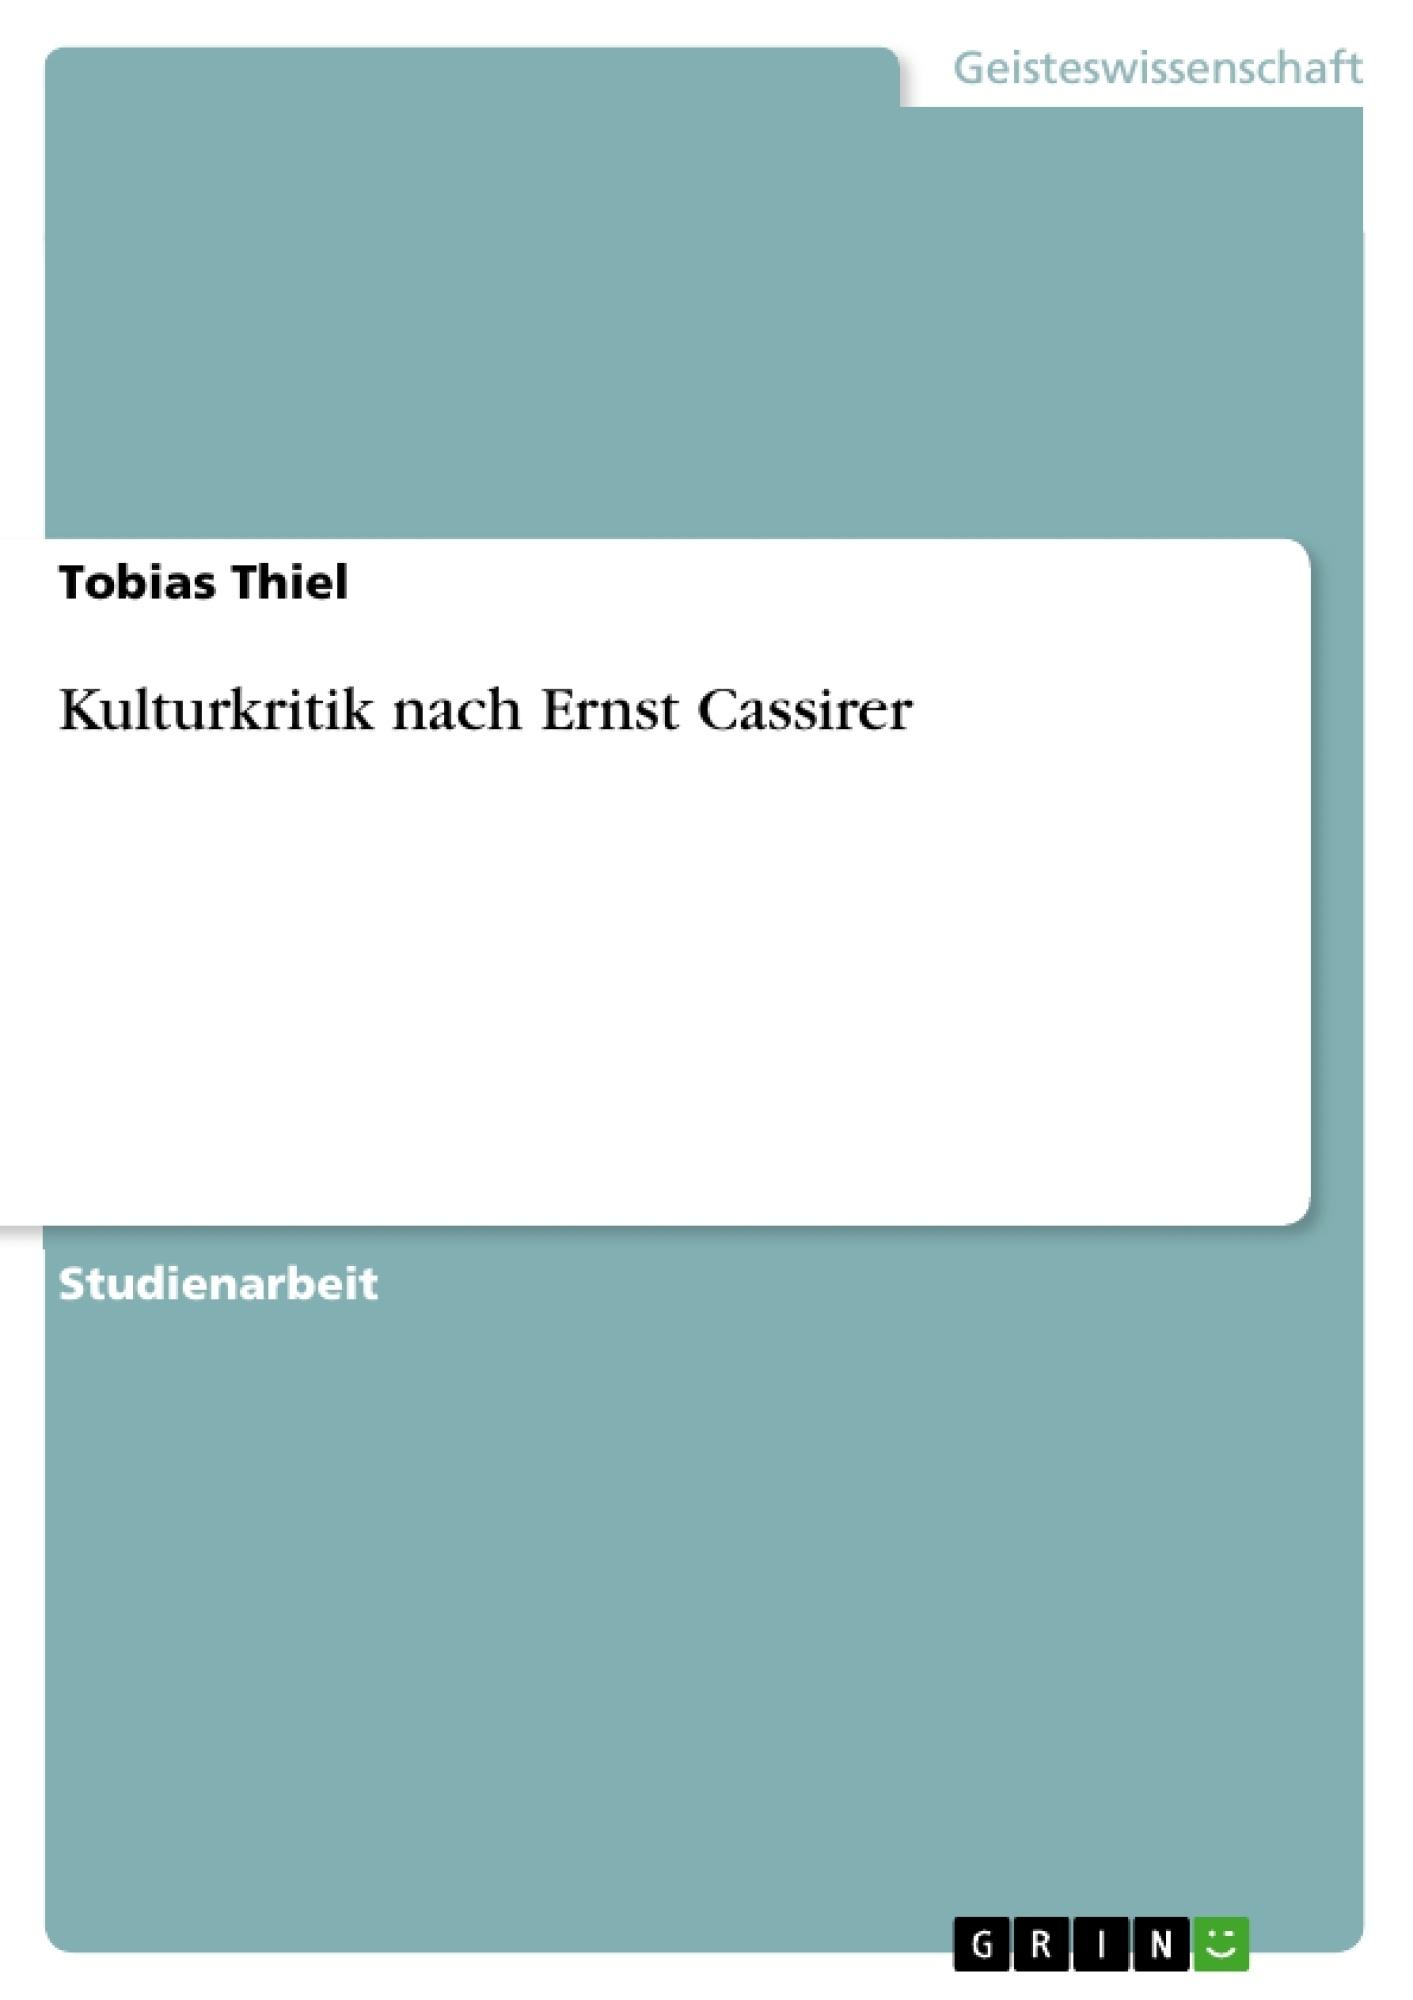 Titel: Kulturkritik nach Ernst Cassirer